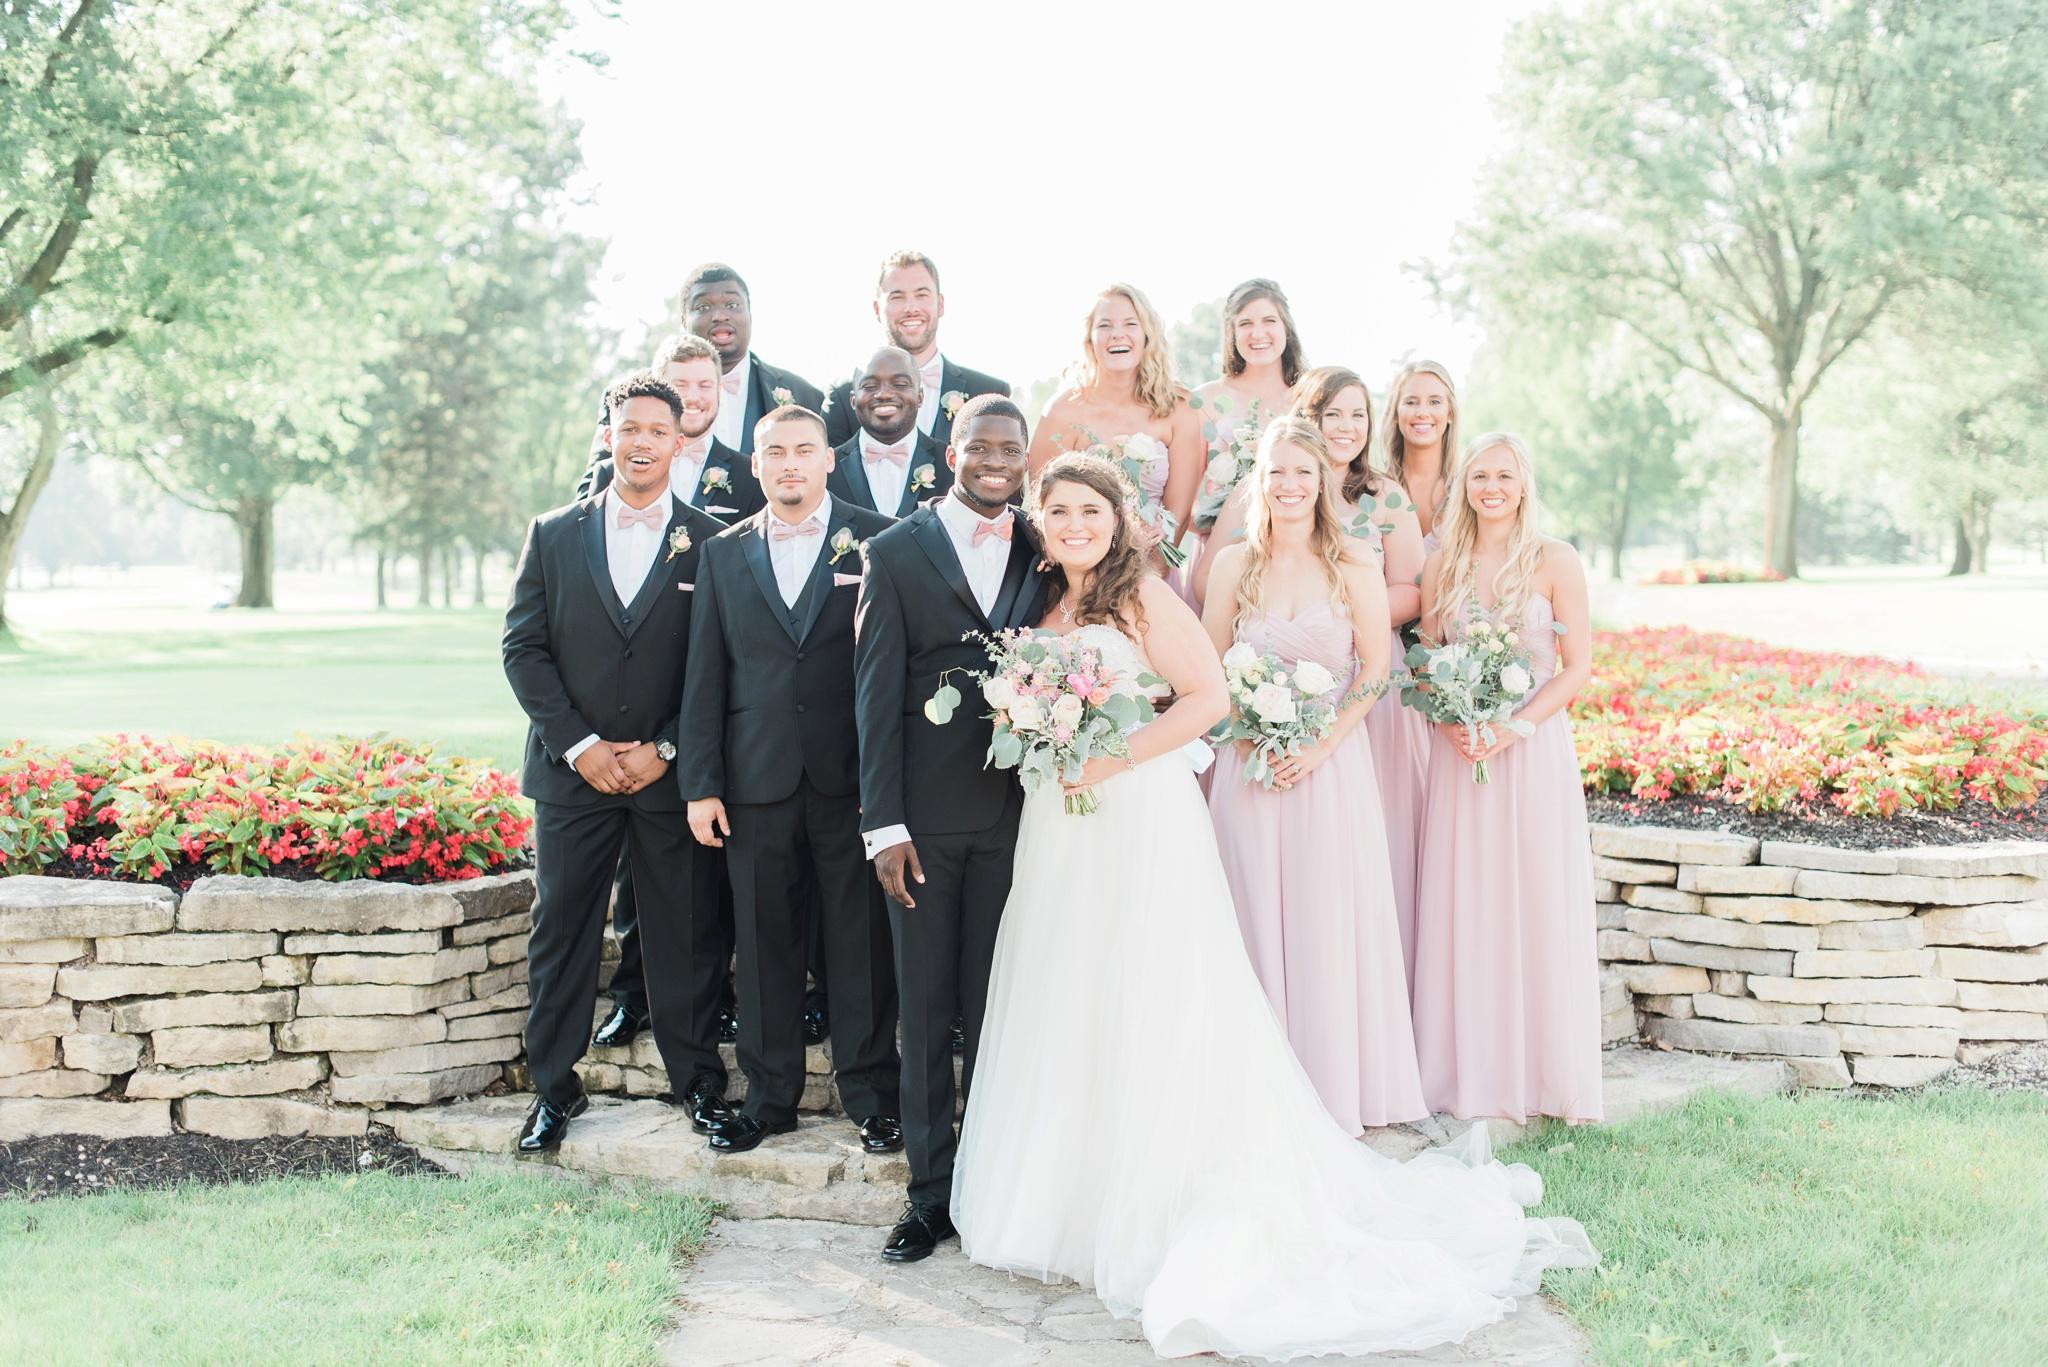 worthington-hills-country-club-wedding-columbus-ohio-meg-evan_0065.jpg